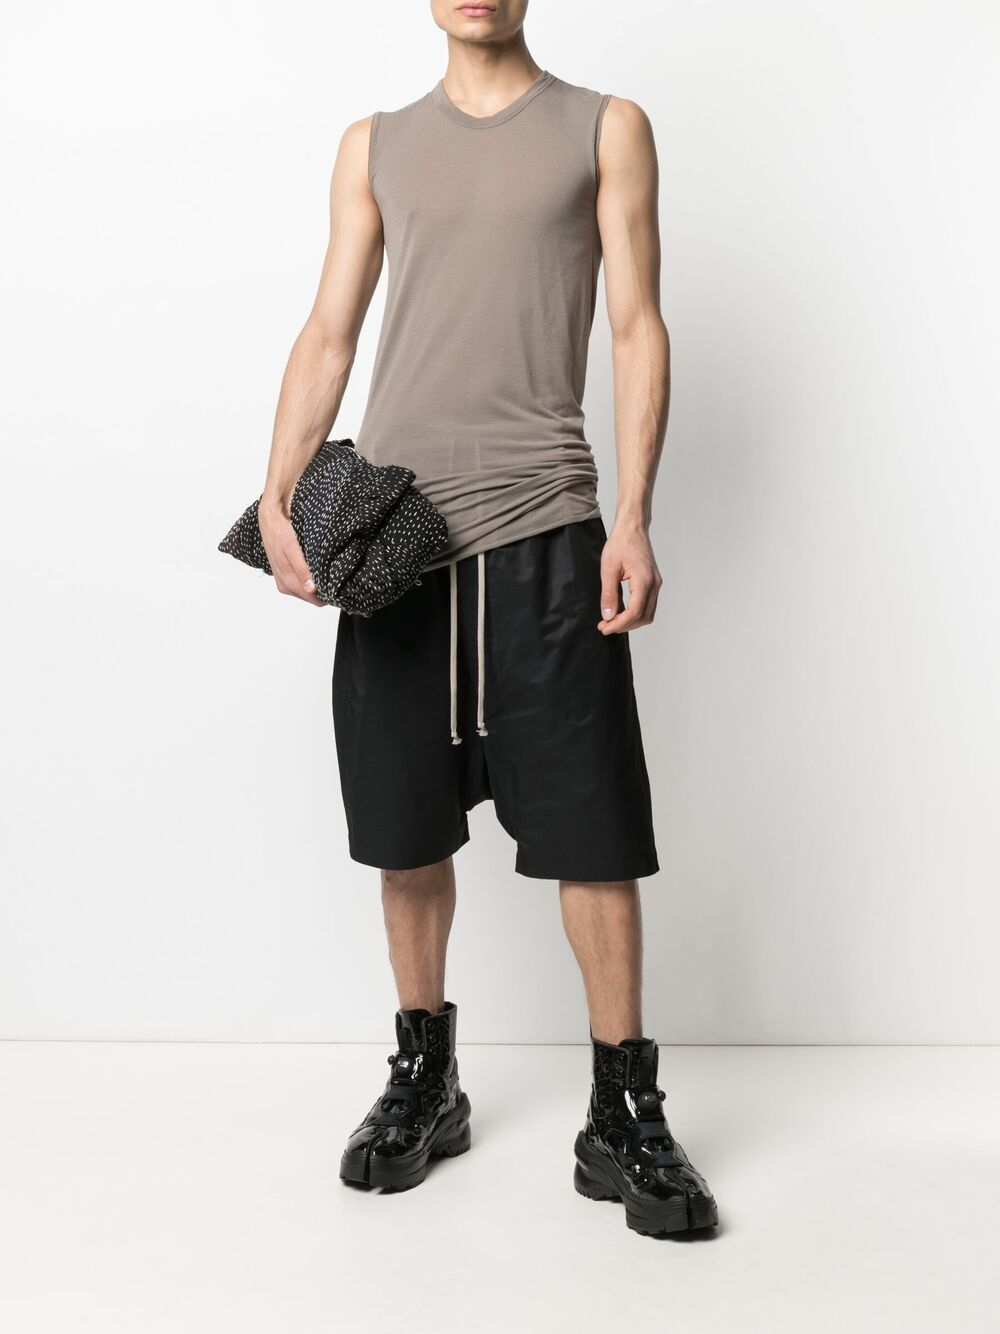 Top lungo marrone uomo cotone RICK OWENS | T-shirt | RU21S6151 JS34